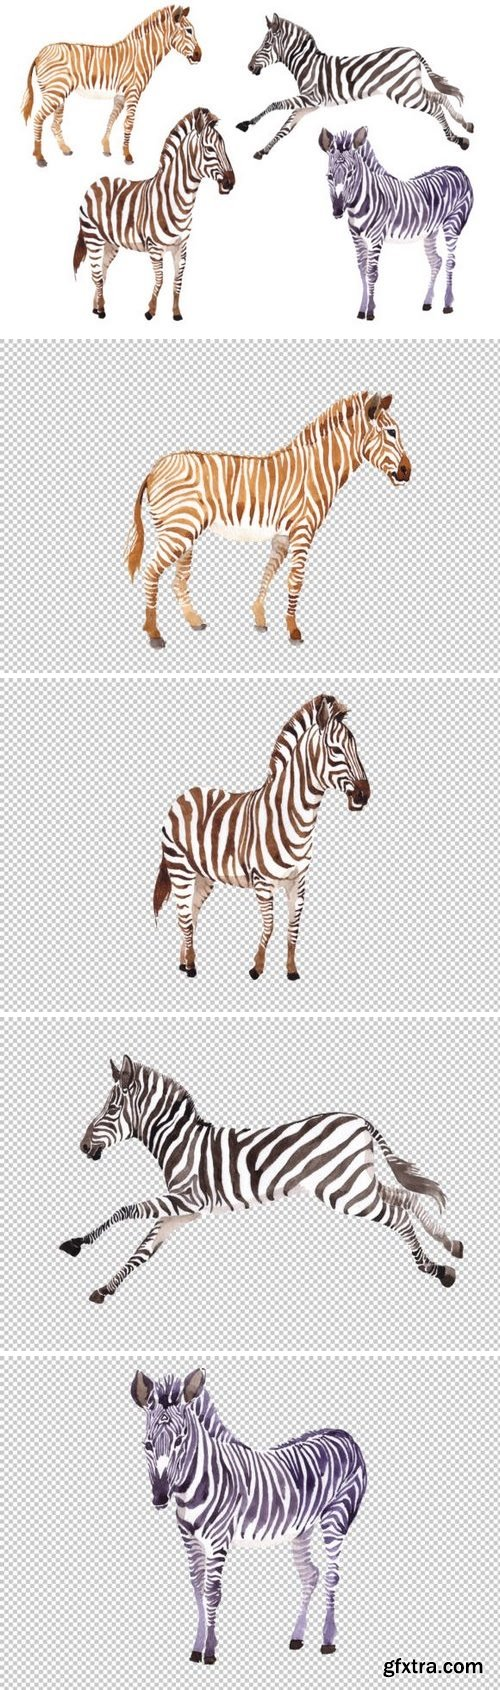 CM - Zebra set Watercolor png 3486061